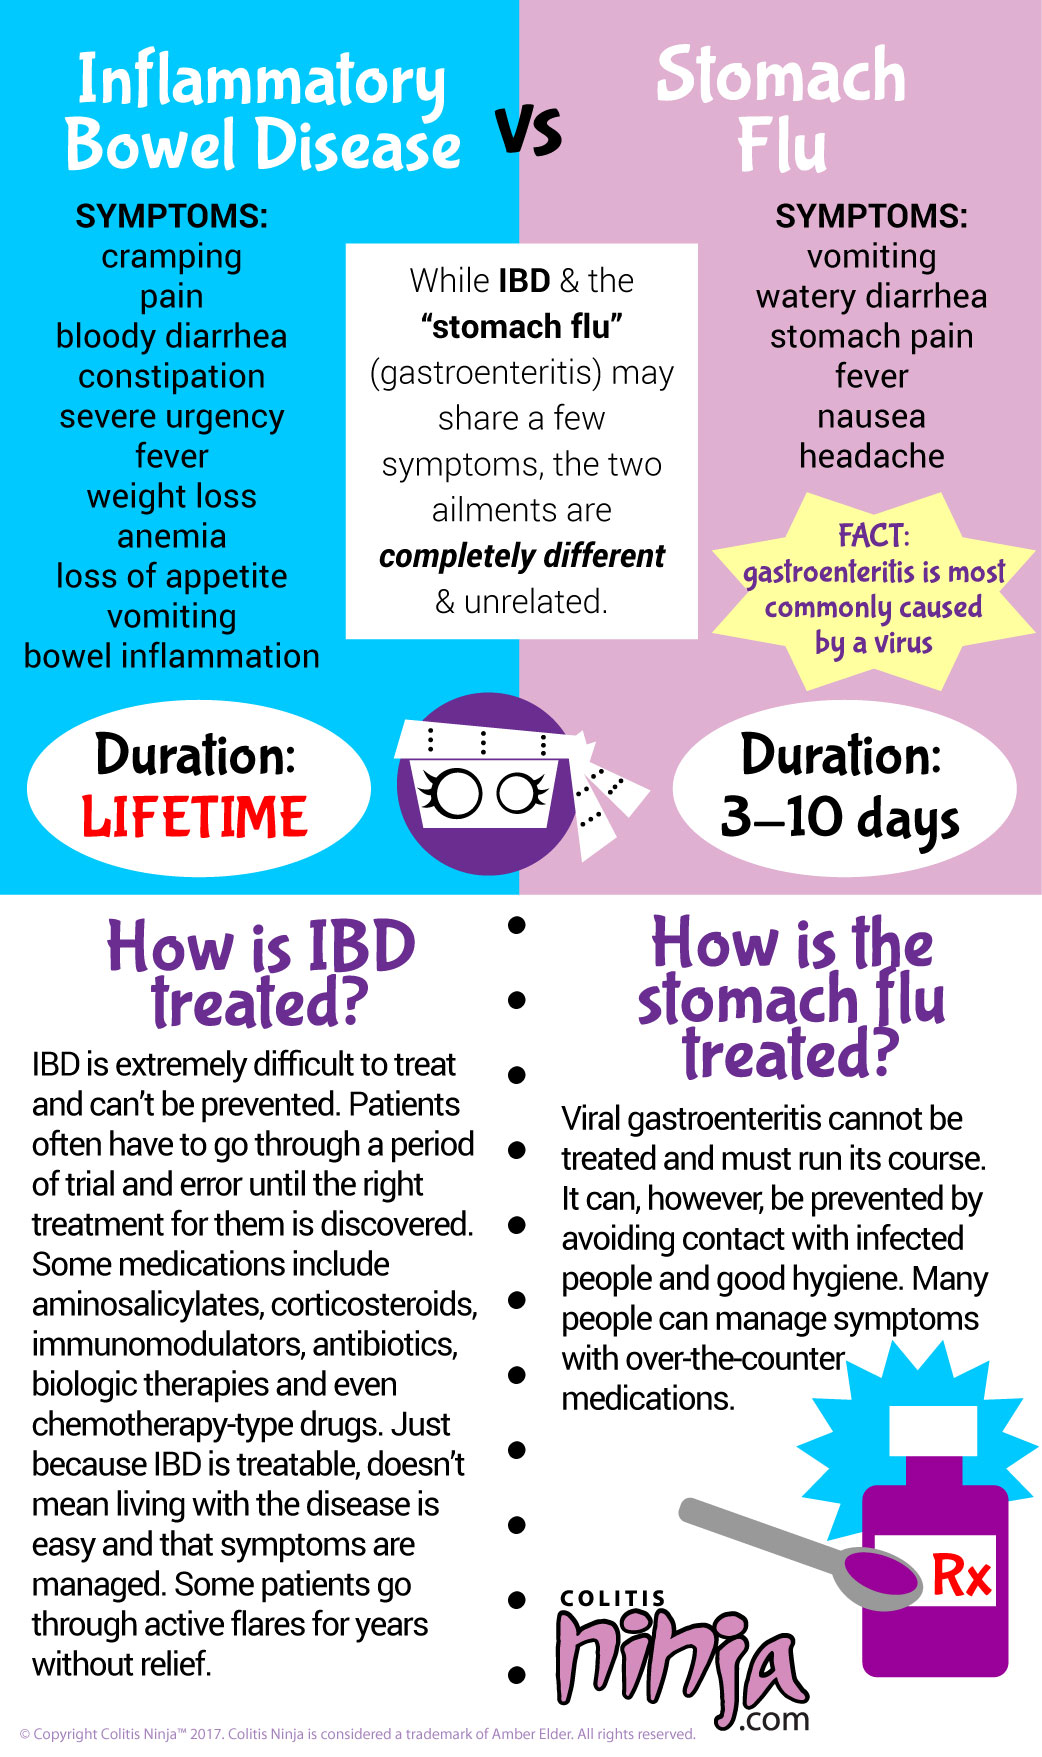 Intestinal flu: symptoms, treatment